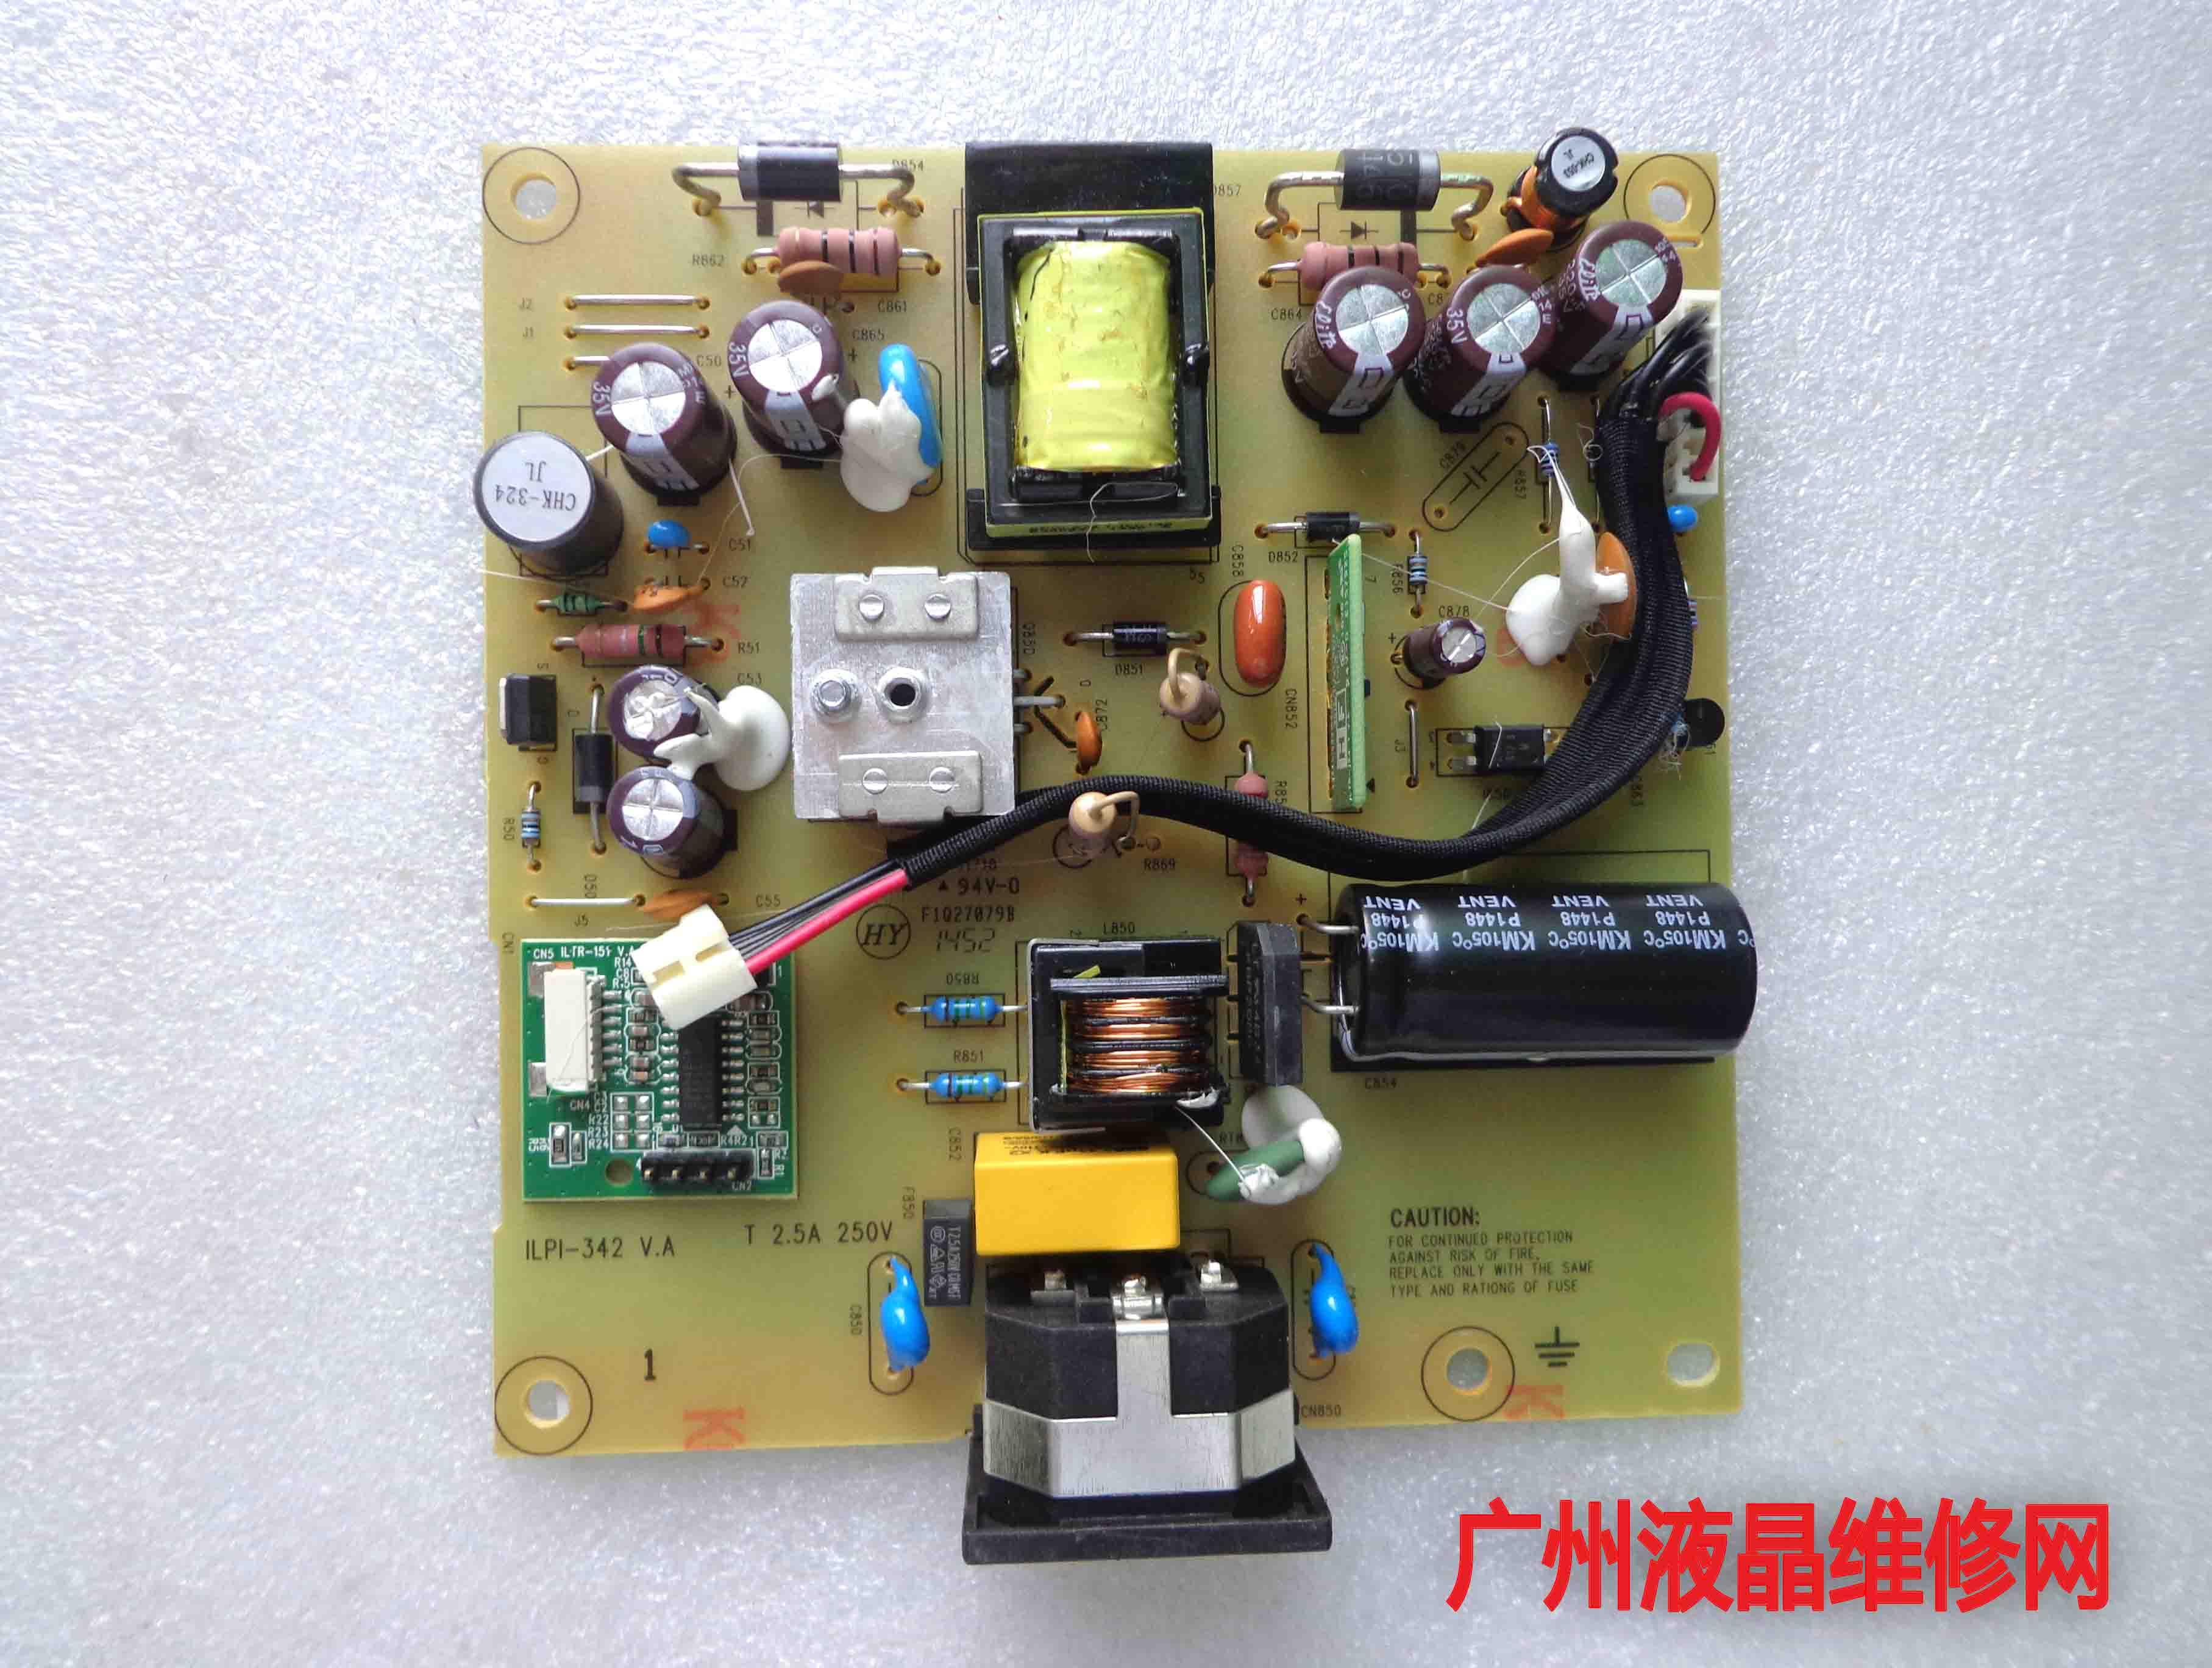 E2015HVF E2215HVF original power supply board ILPI-342 491A01131400H06